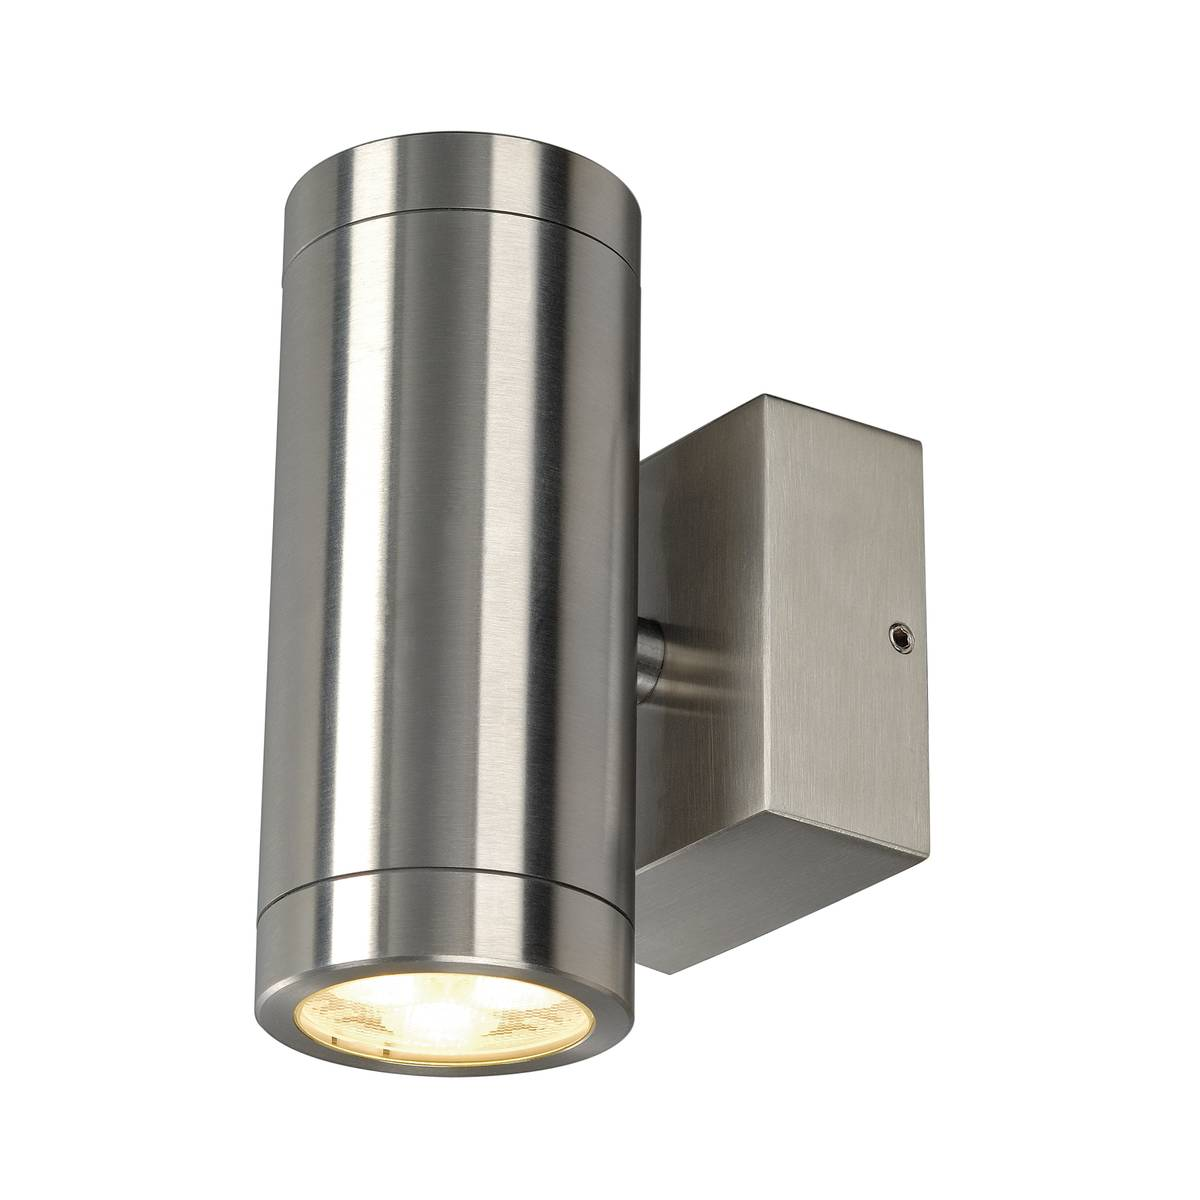 SLV buiten wandlamp Astina Steel - led - roestvrij staal